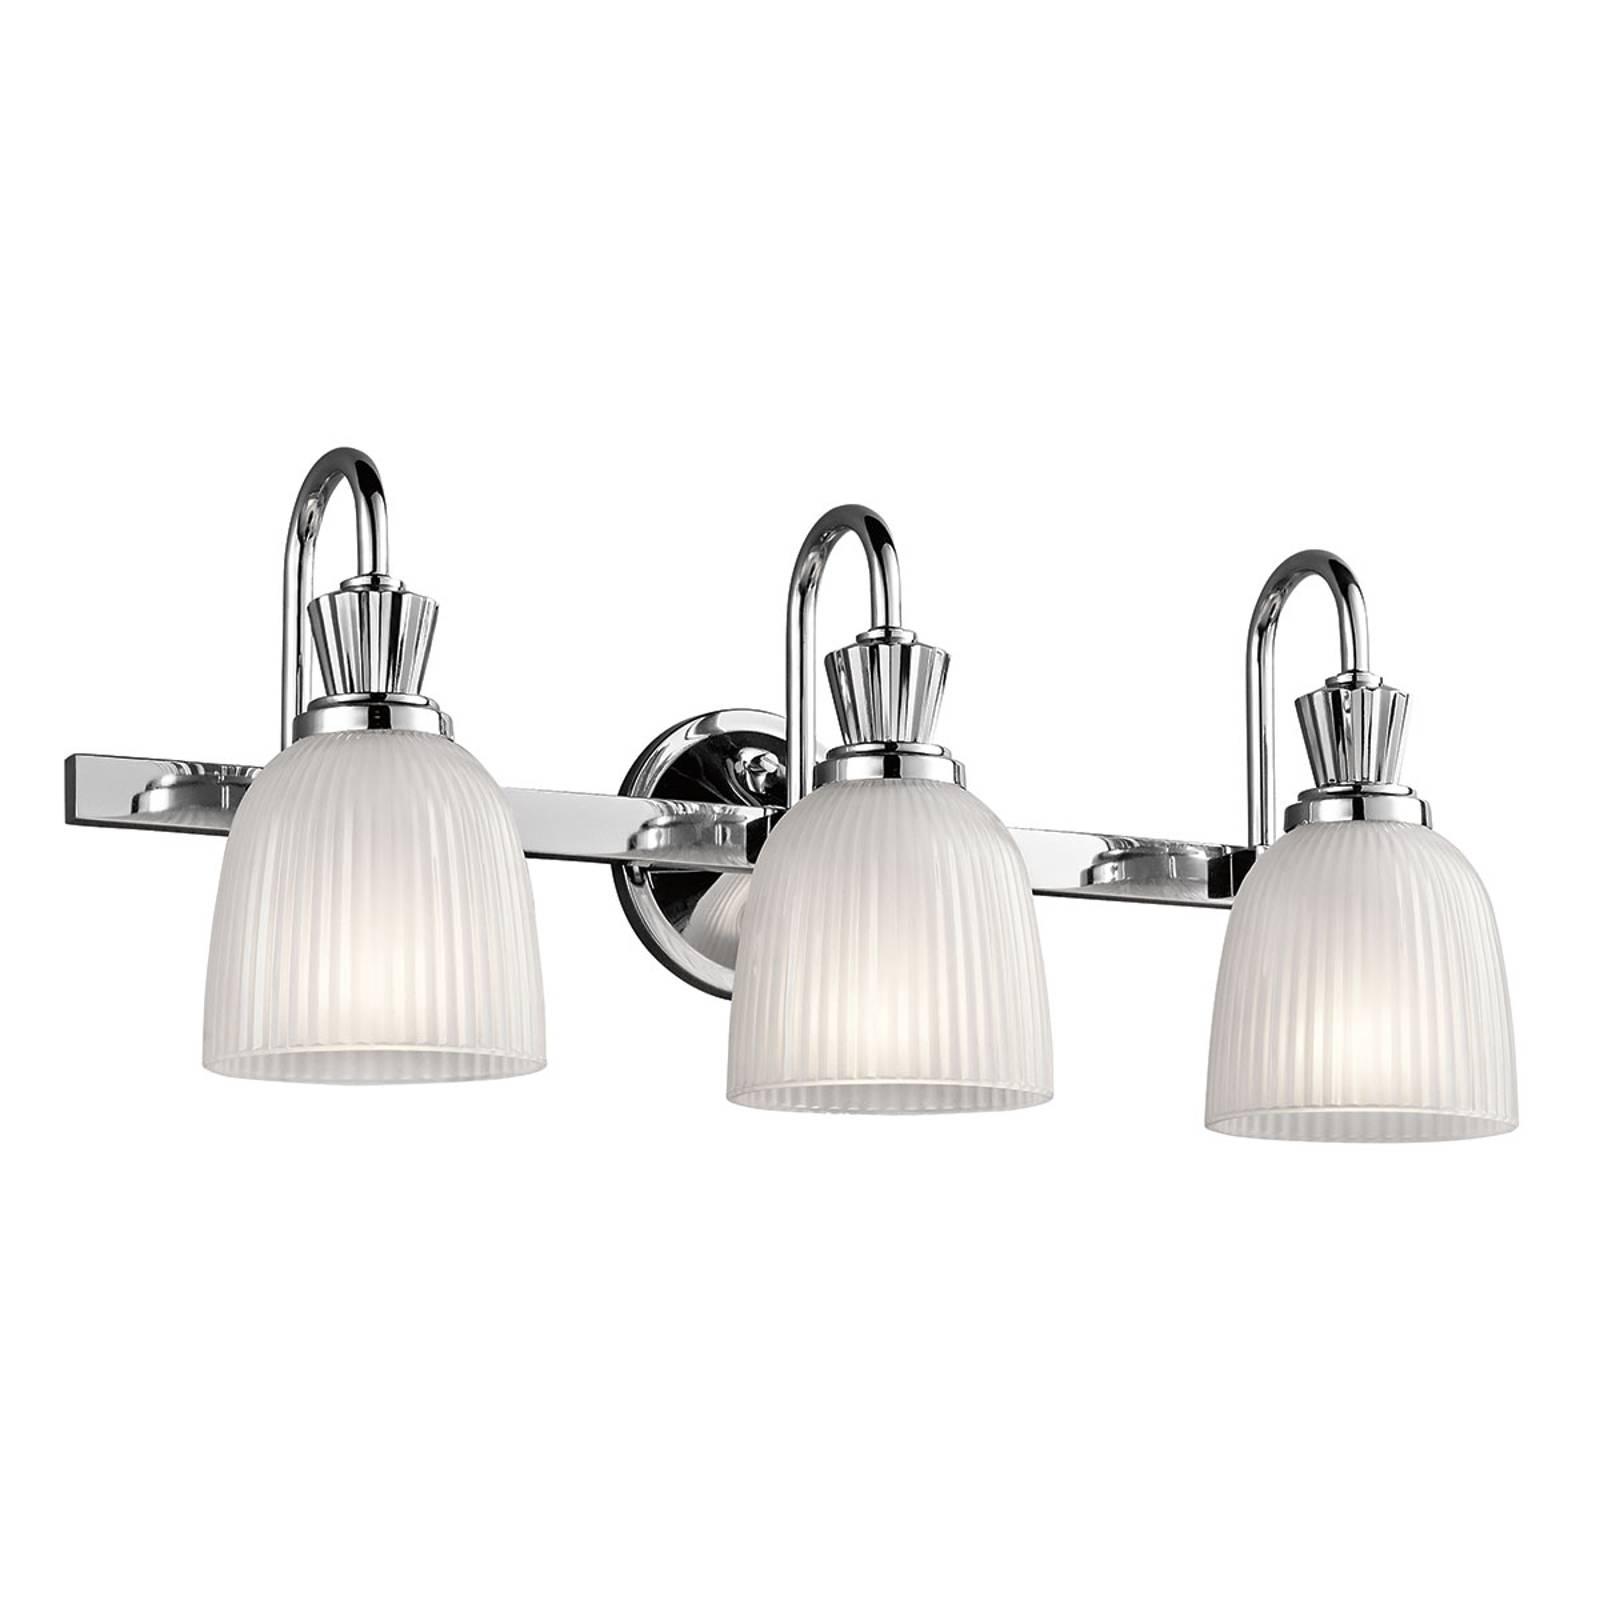 LED-Bad-Wandleuchte Cora 3-flammig